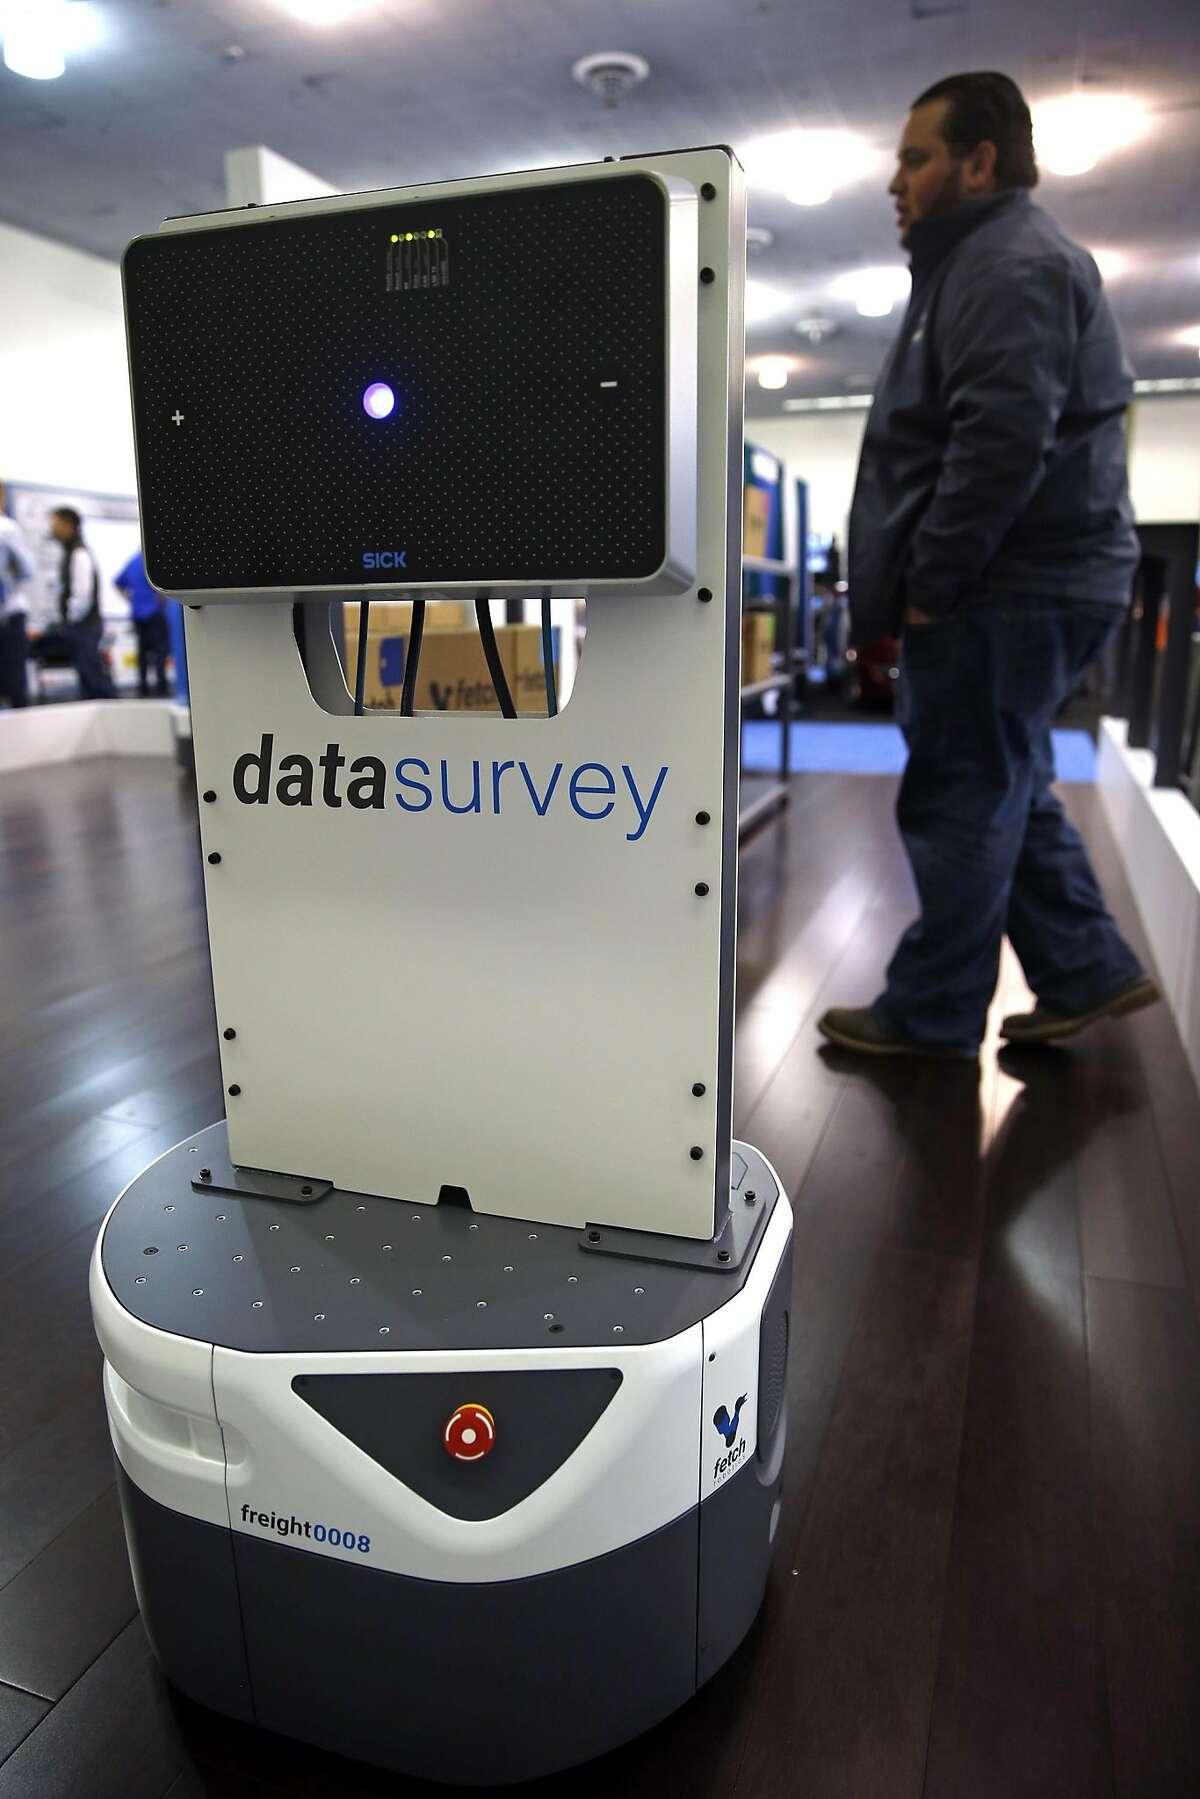 Fetch Robotics' Data Survey robot during RoboBusiness at San Jose Convention Center in San Jose, Calif., on Wednesday, September 28, 2016.